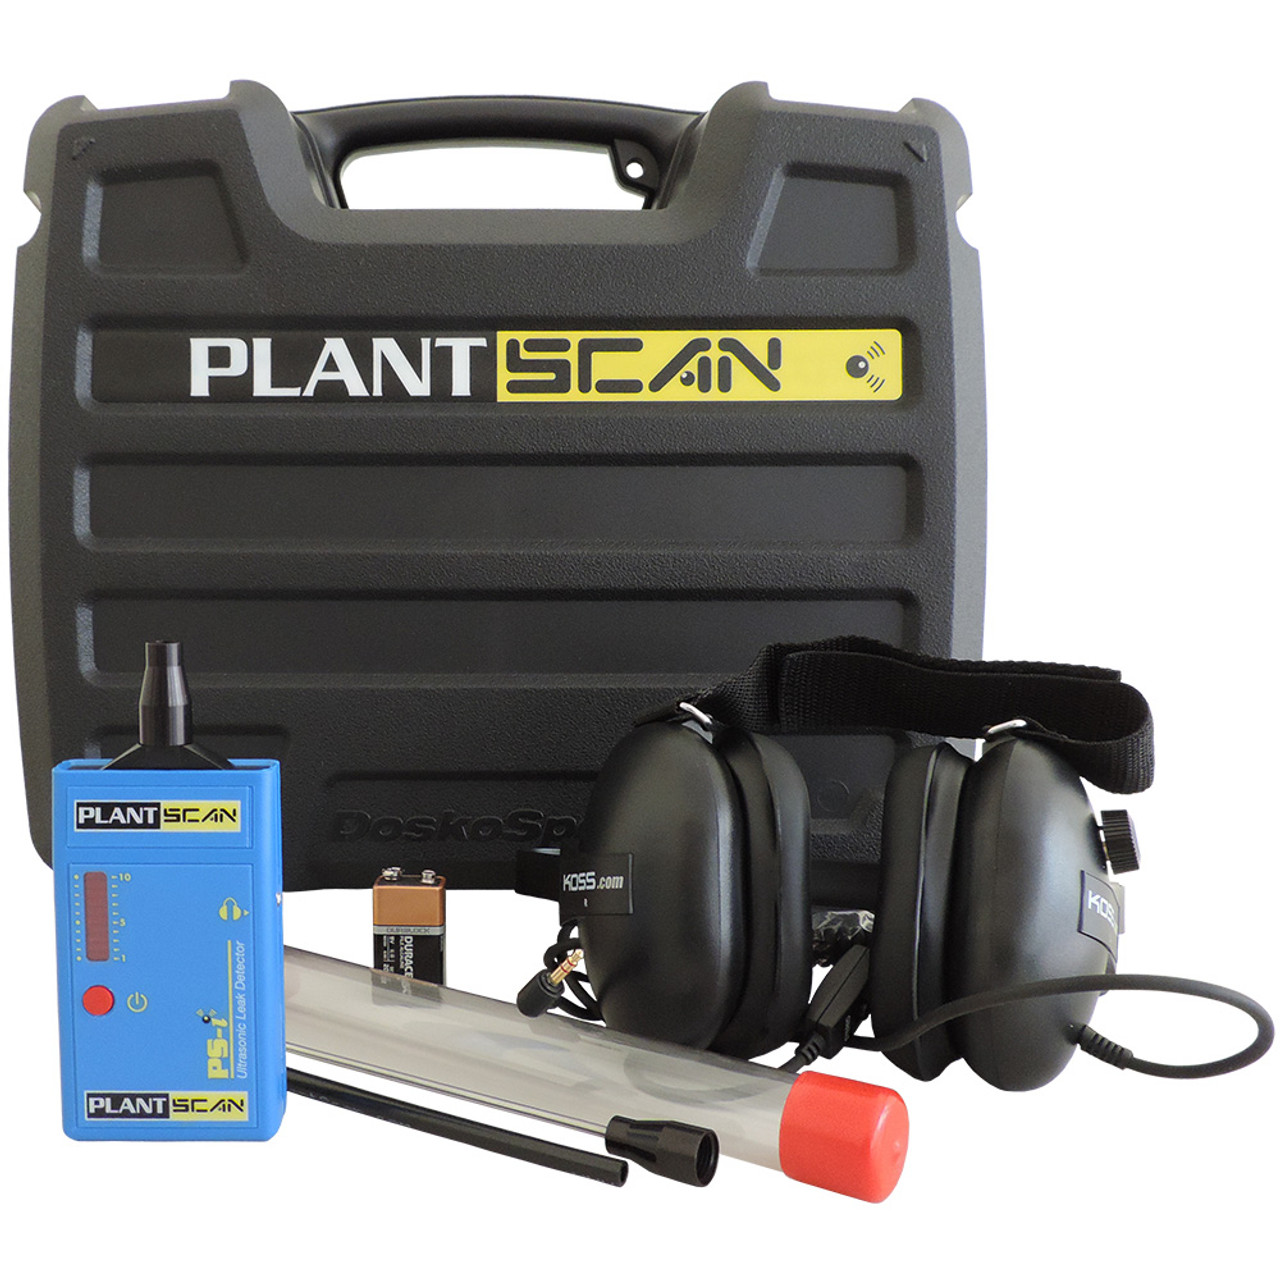 Ps-i HD Kit - Ultrasonic Leak Detector